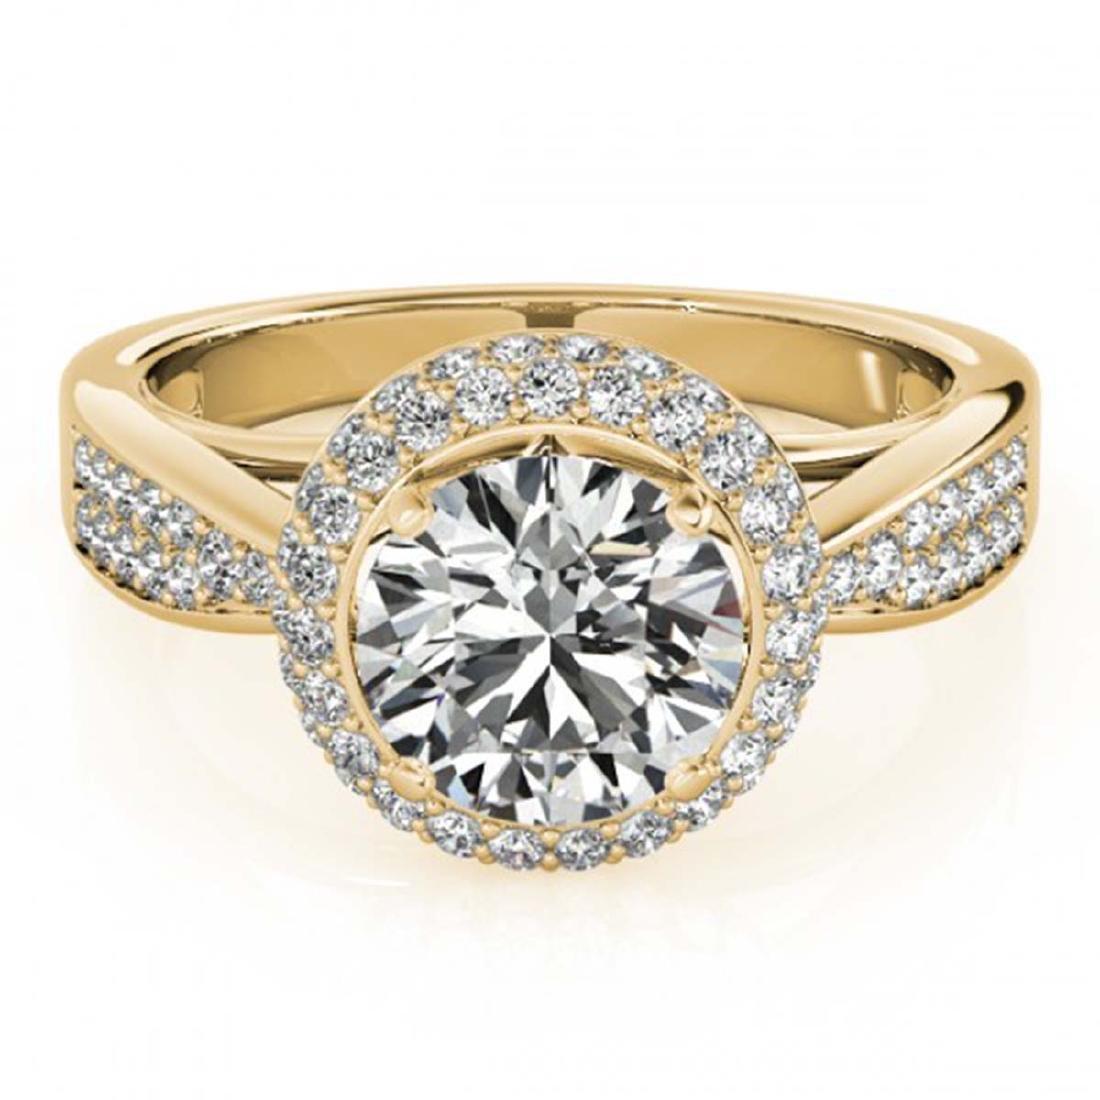 2.15 ctw VS/SI Diamond Halo Ring 18K Yellow Gold -